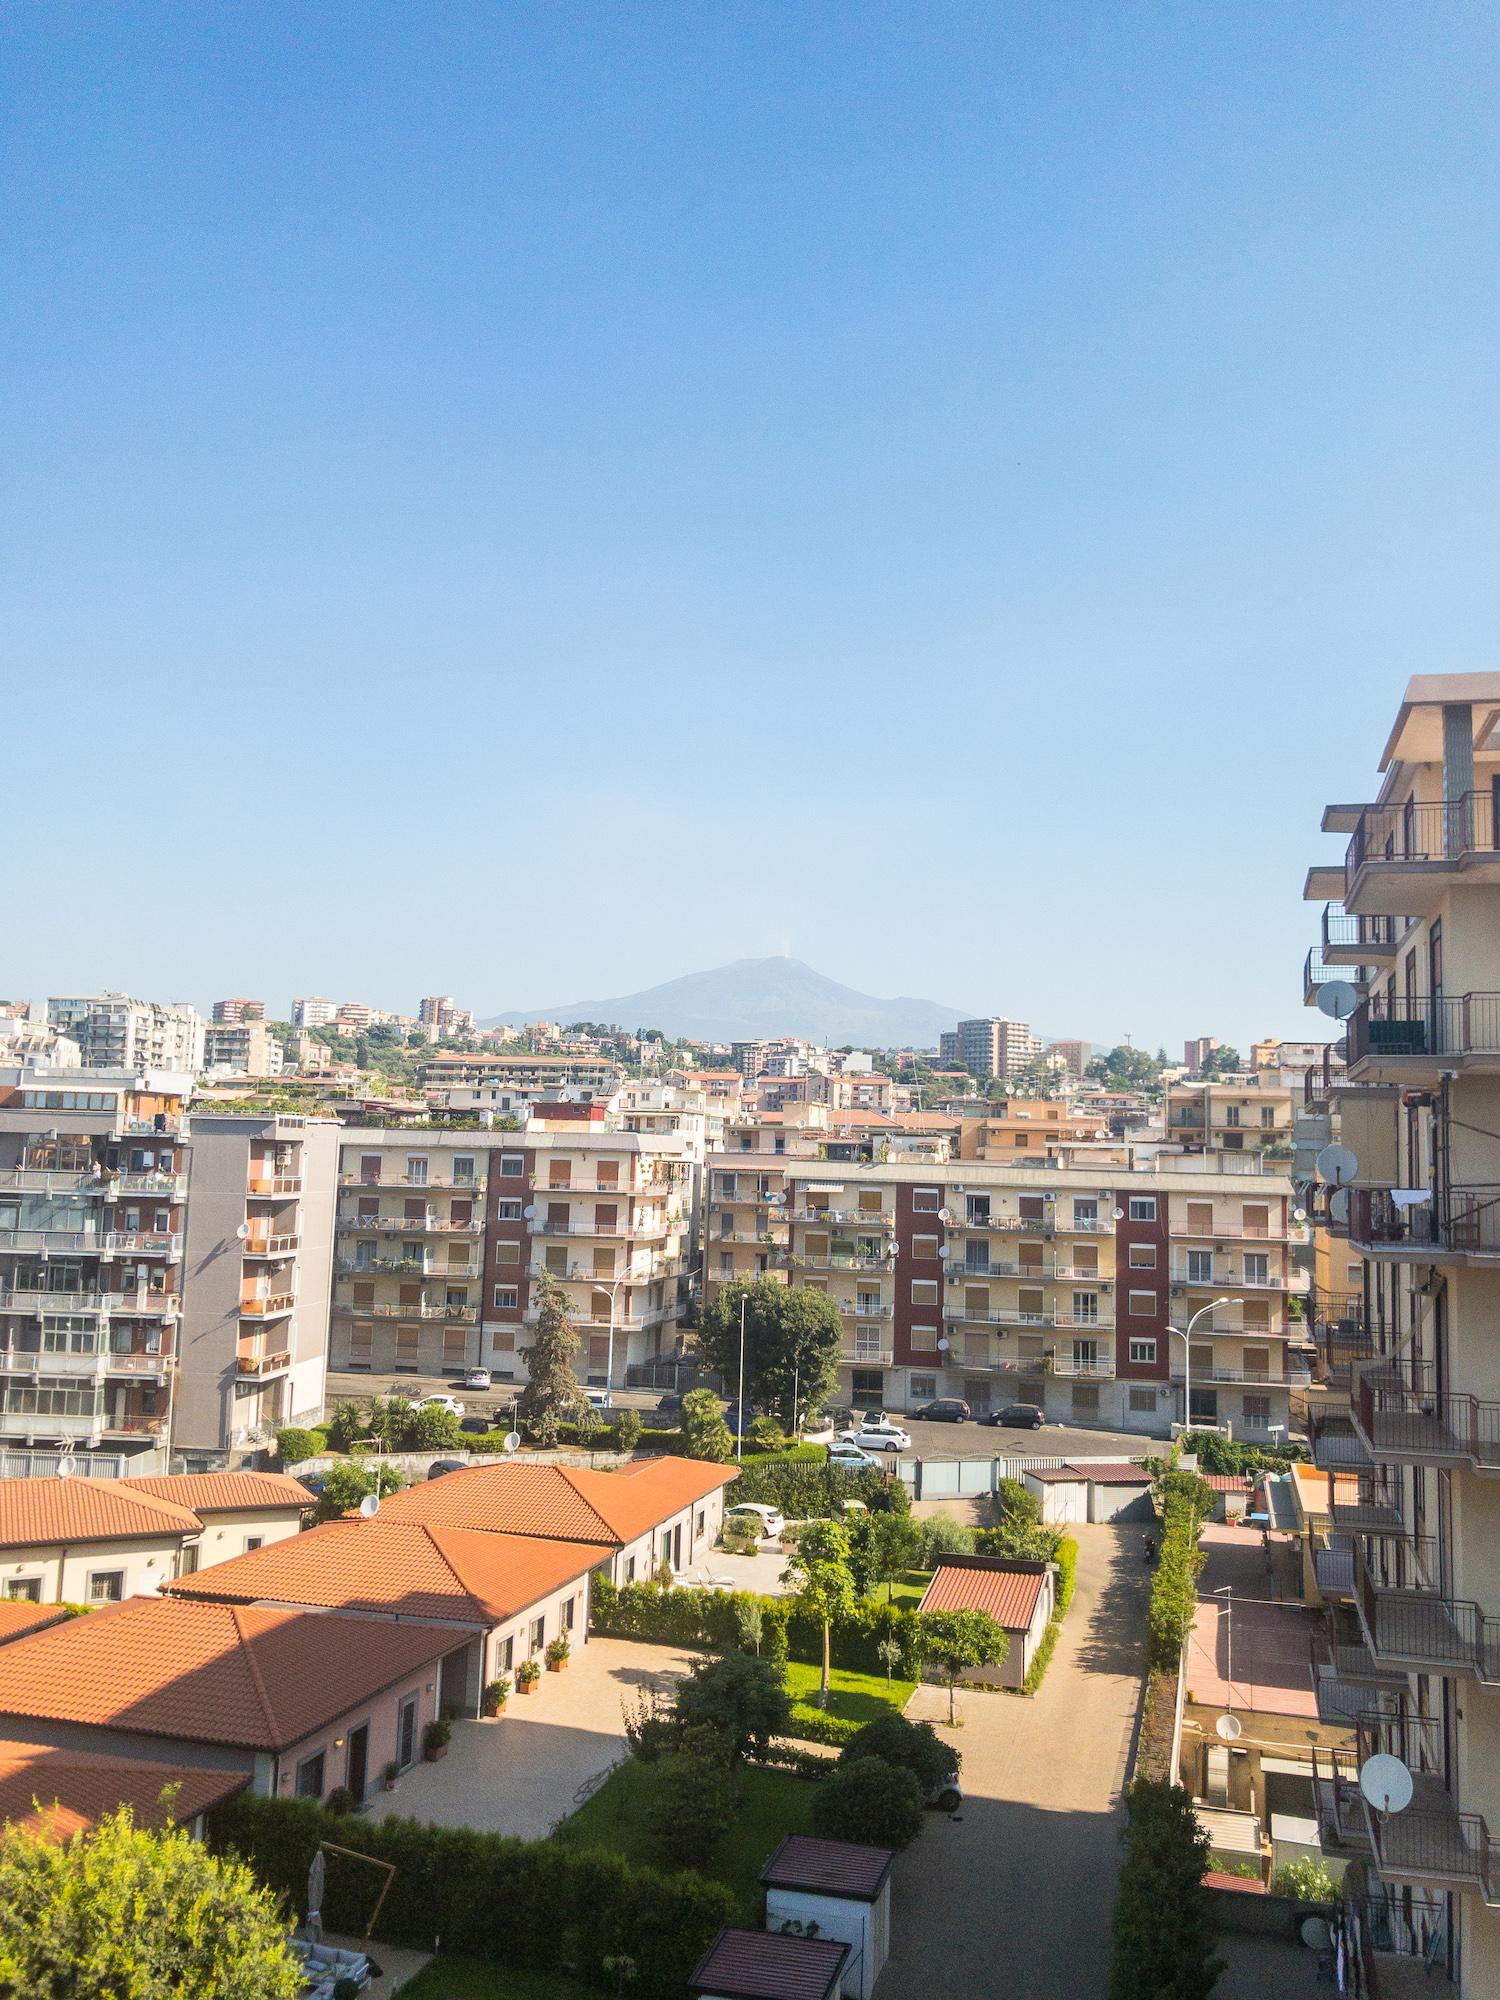 Catania Sicily apartment Etna view.jpg